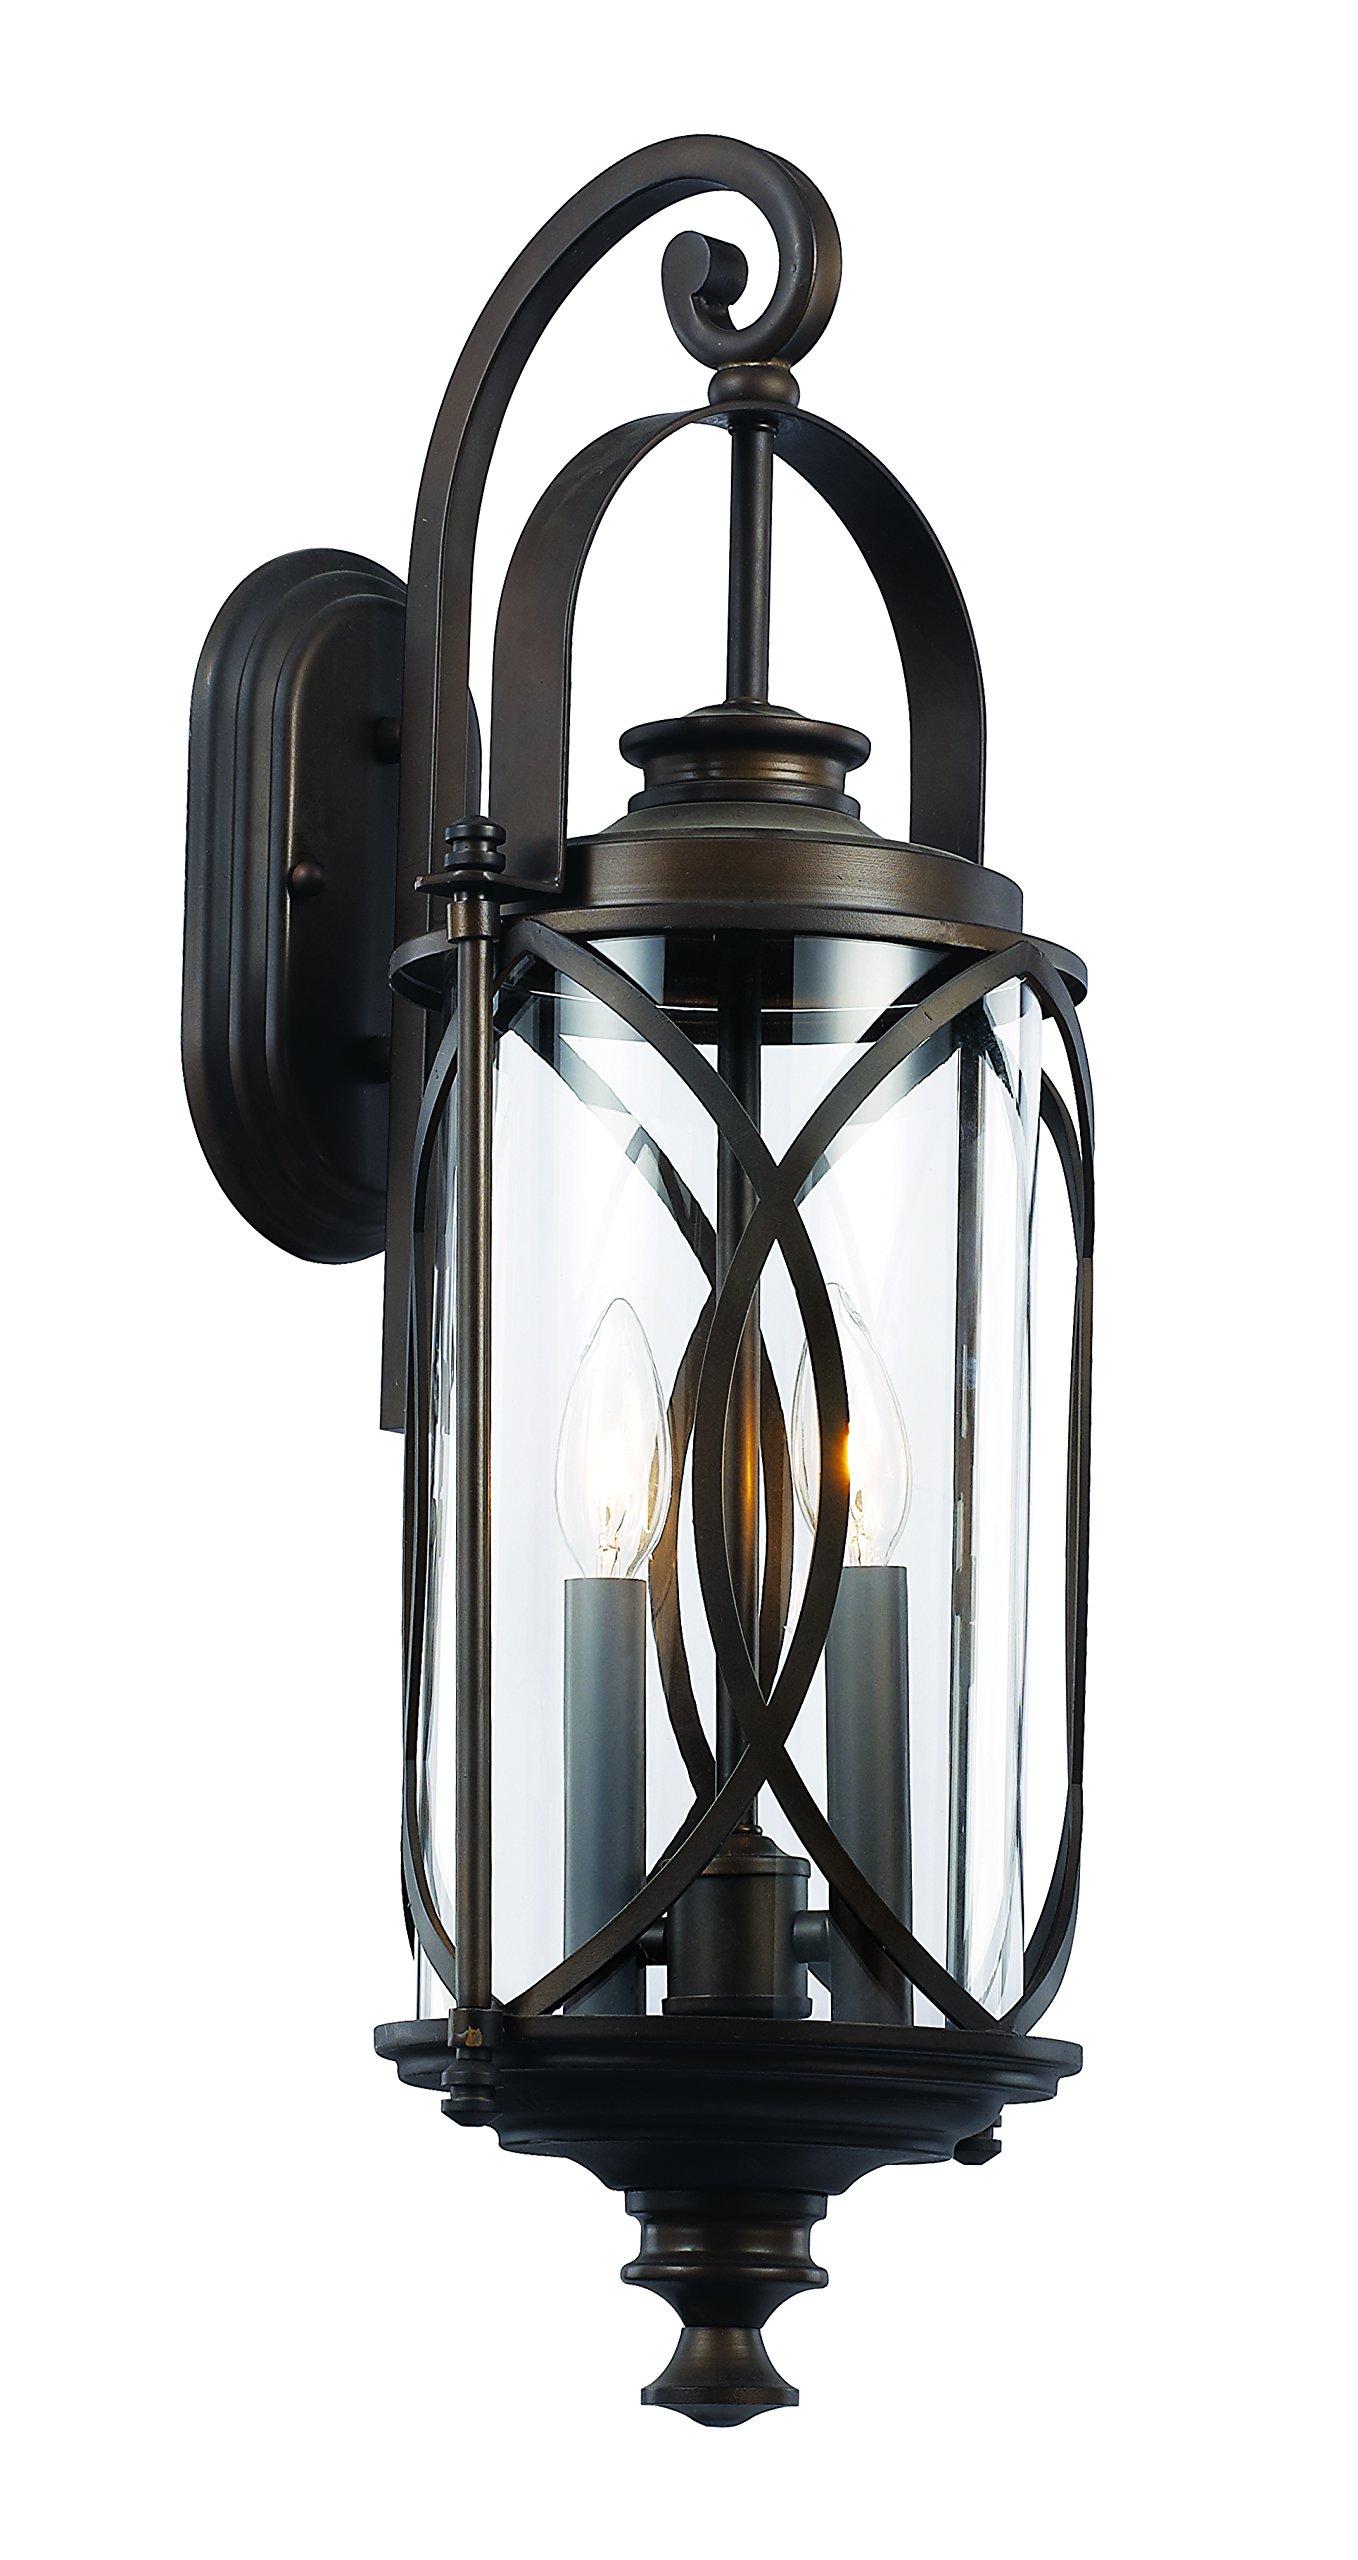 Trans Globe Lighting 40411 ROB Outdoor Fiesta 24'' Wall Lantern, Rubbed Oil Bronze